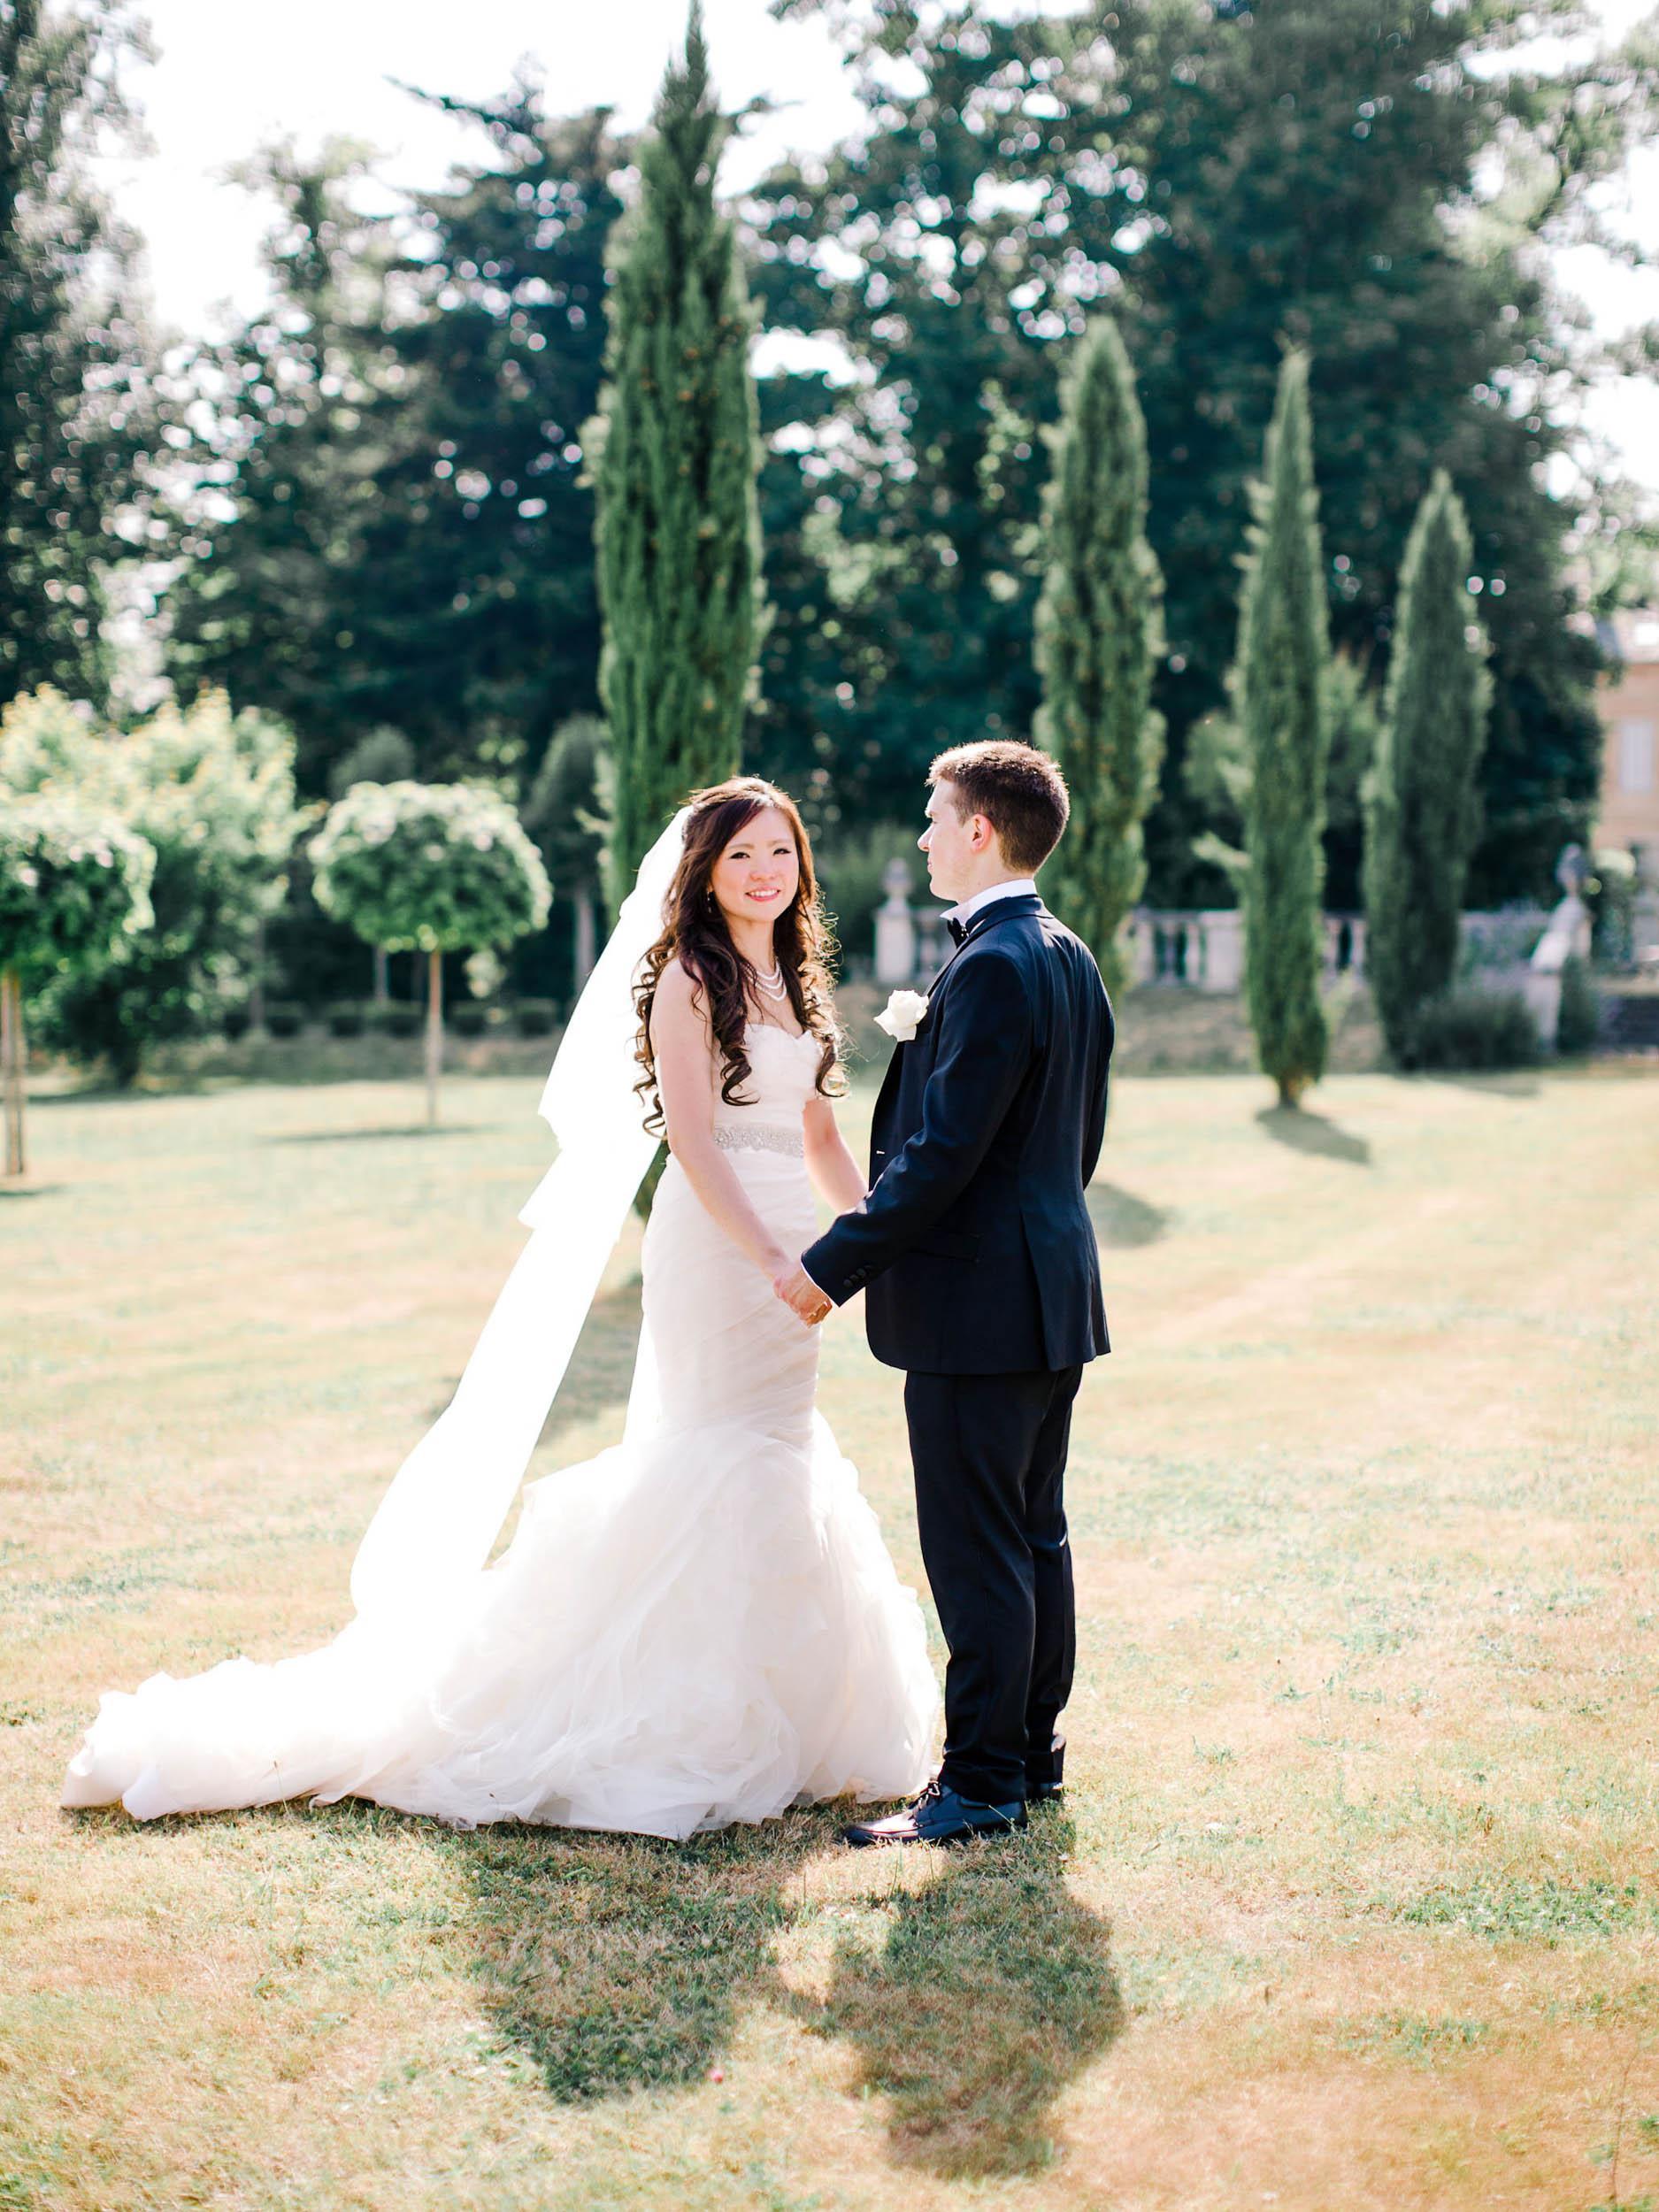 Amy O'Boyle Photography- Destination & UK Fine Art Film Wedding Photographer- Chateau La Durantie Wedding-42.jpg